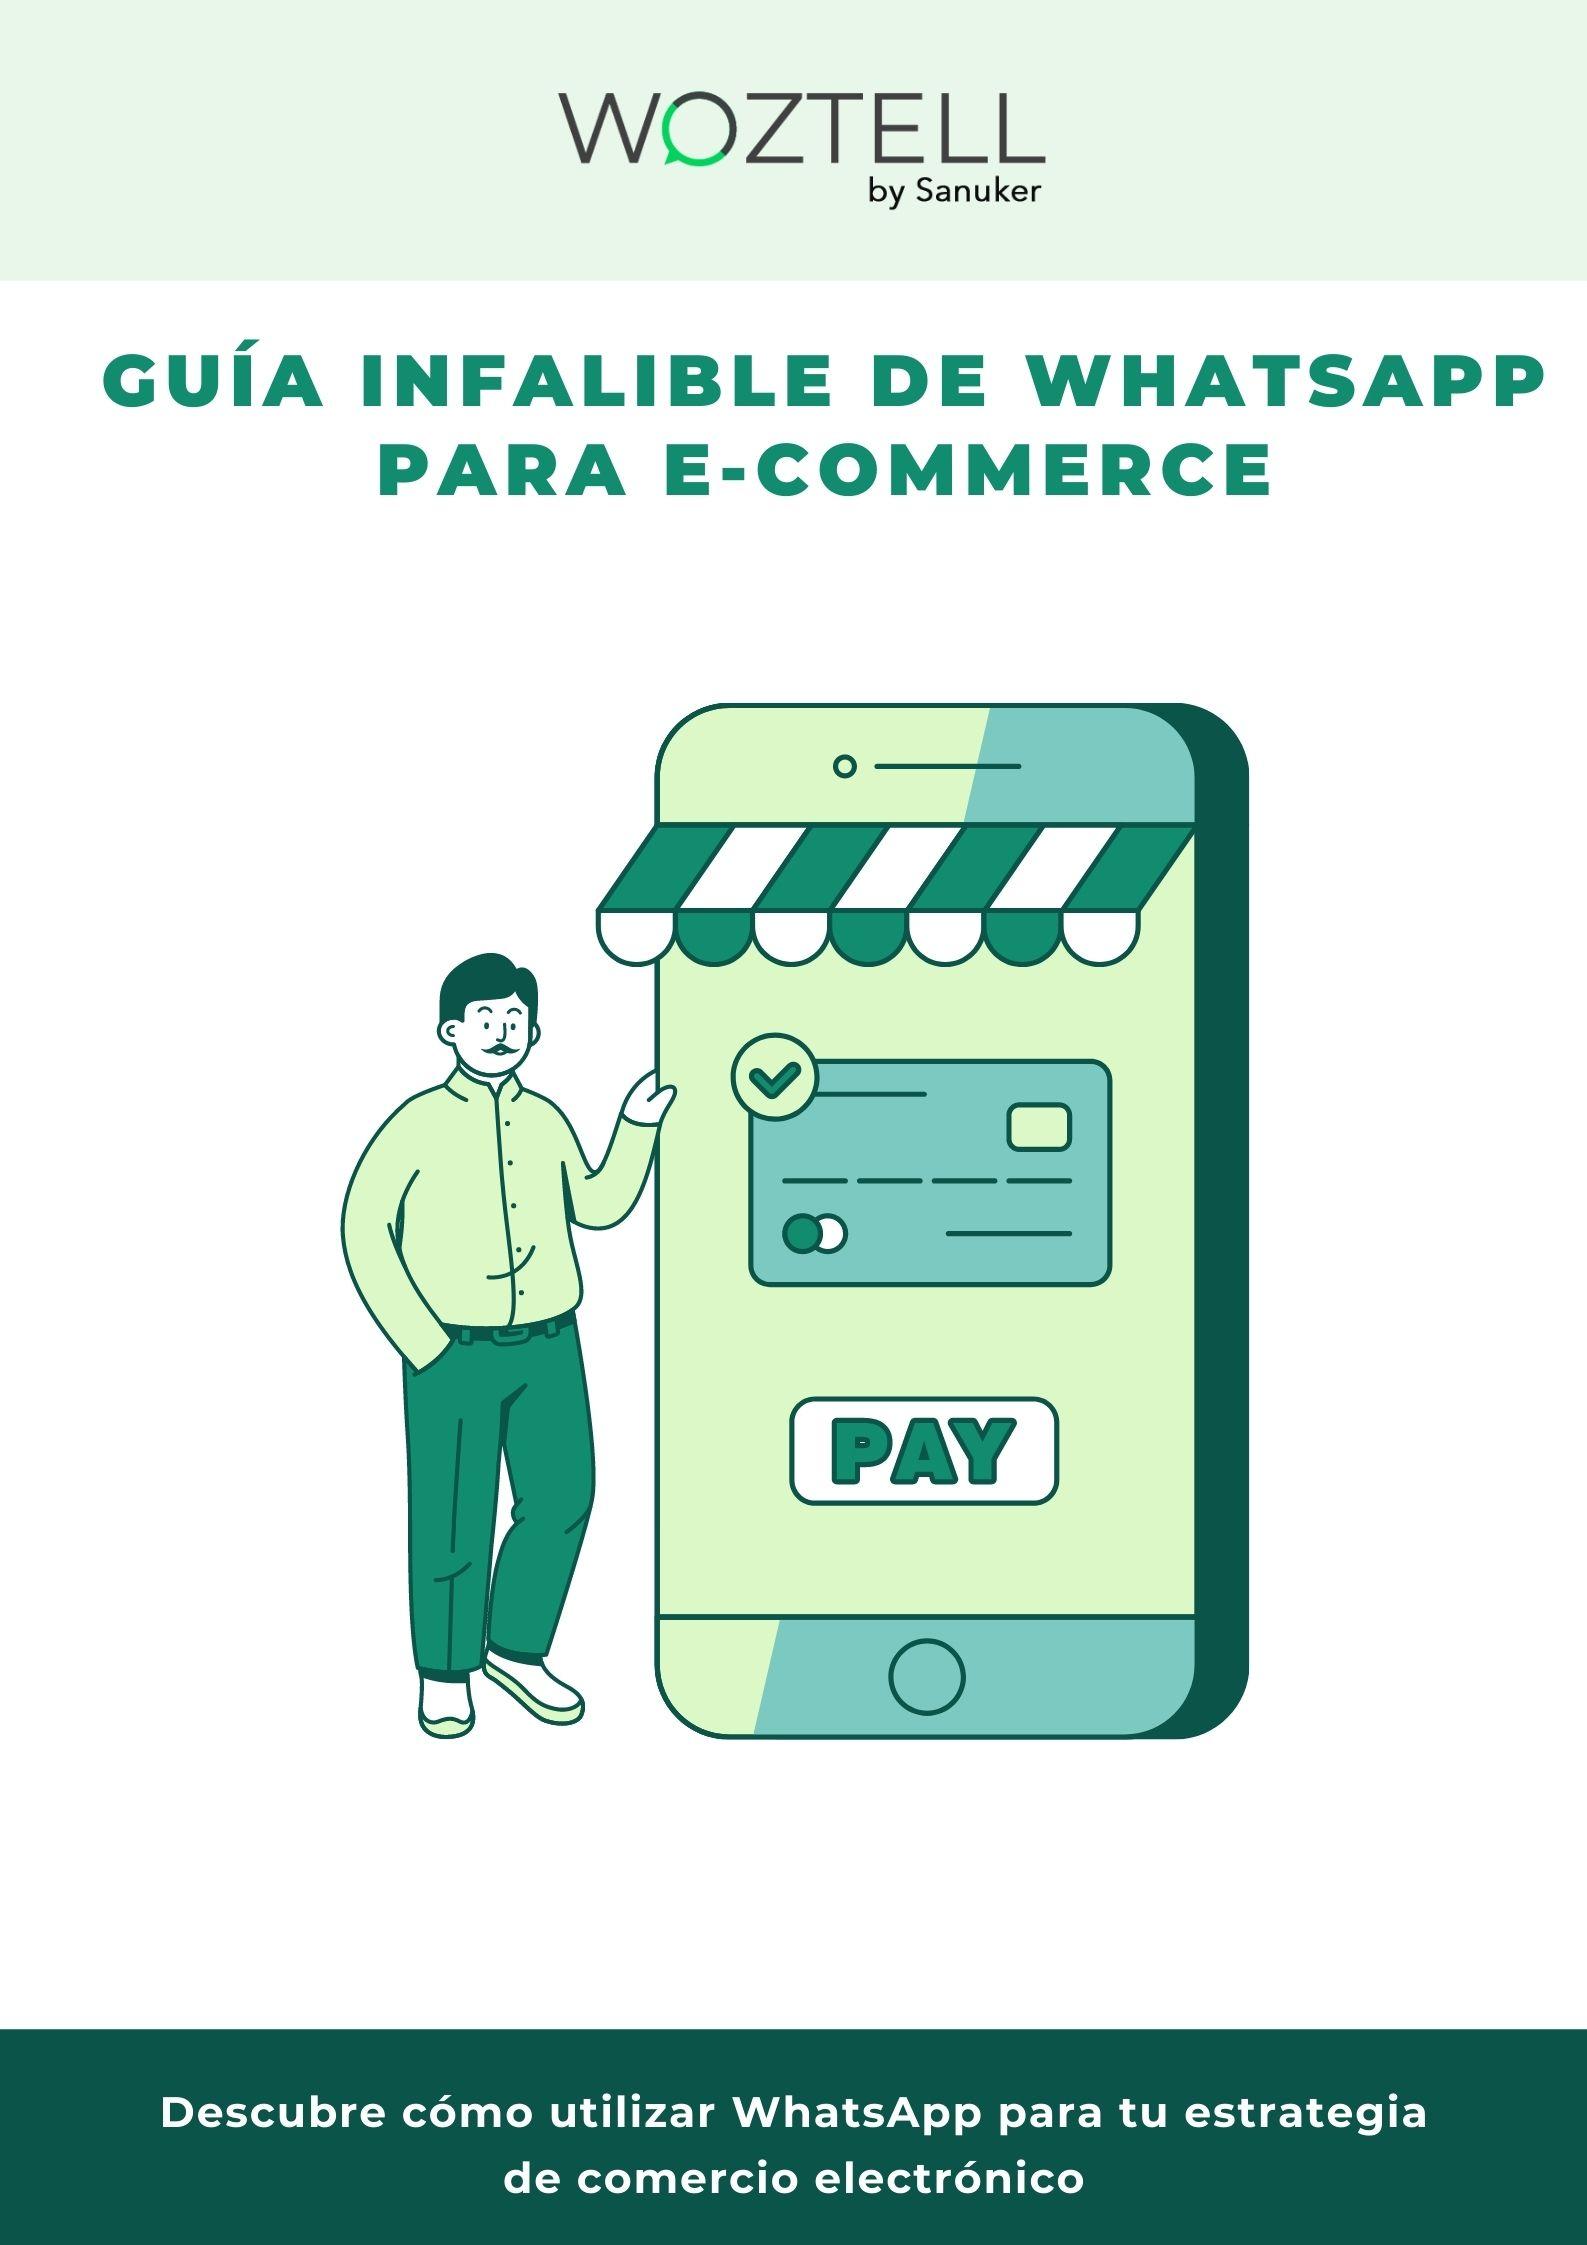 WhatsApp para e-commmerce